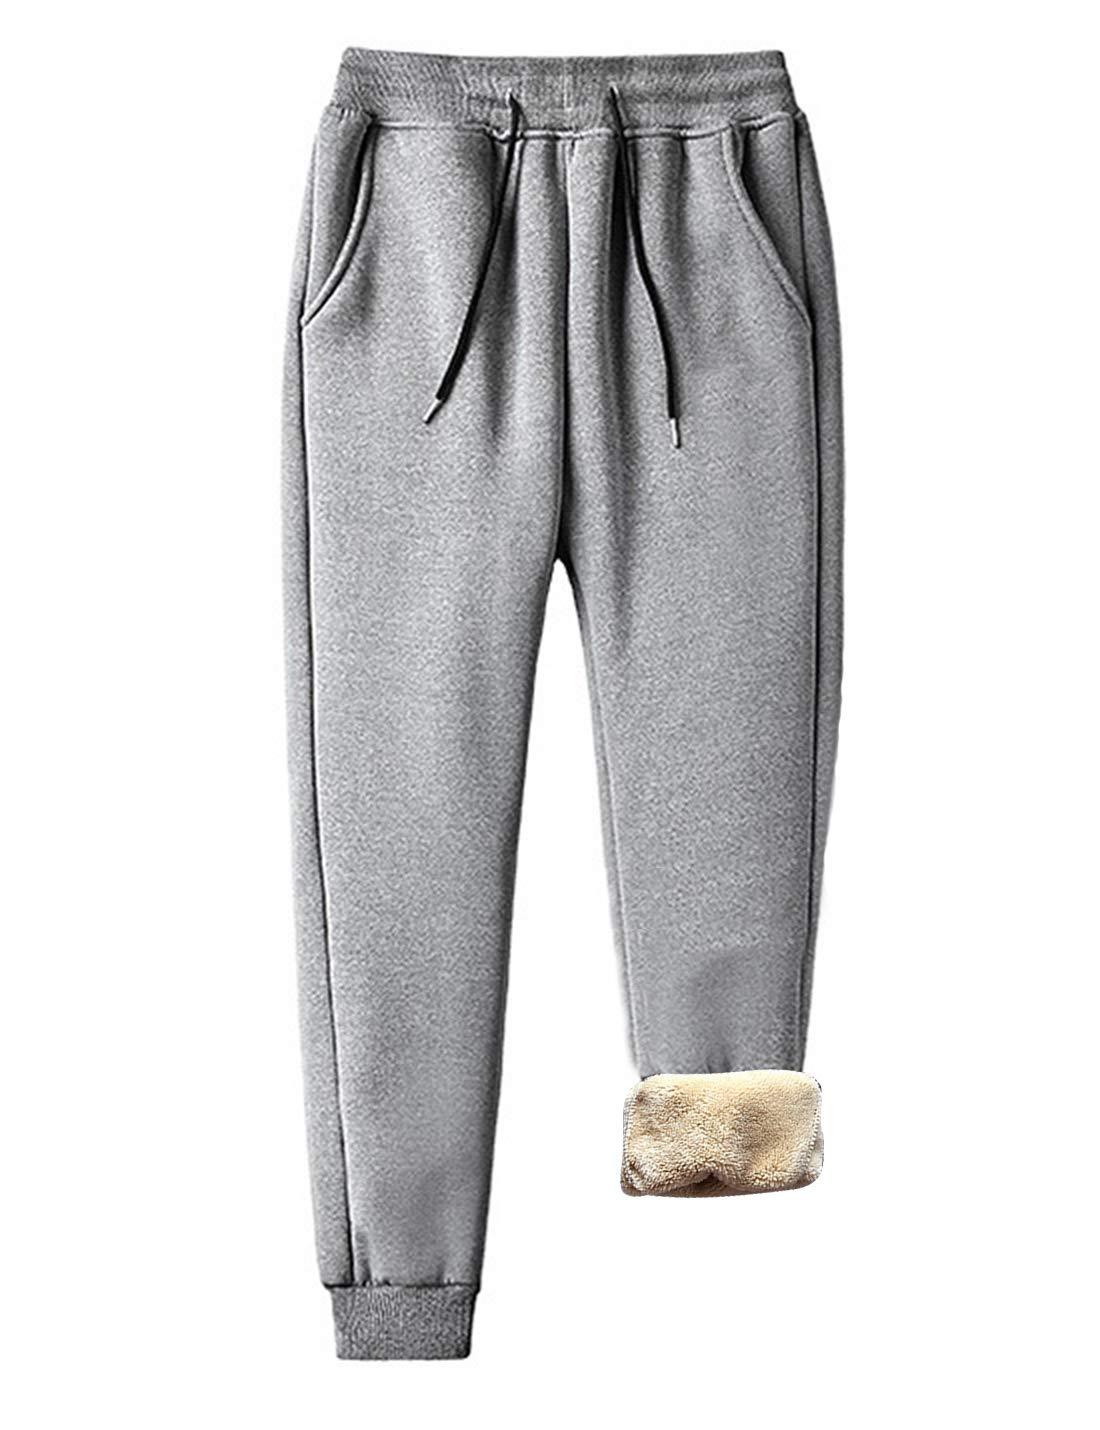 Omoone Men's Casual Drawstring Waist Fleece Lined Cuffed Jogger Sweatpants